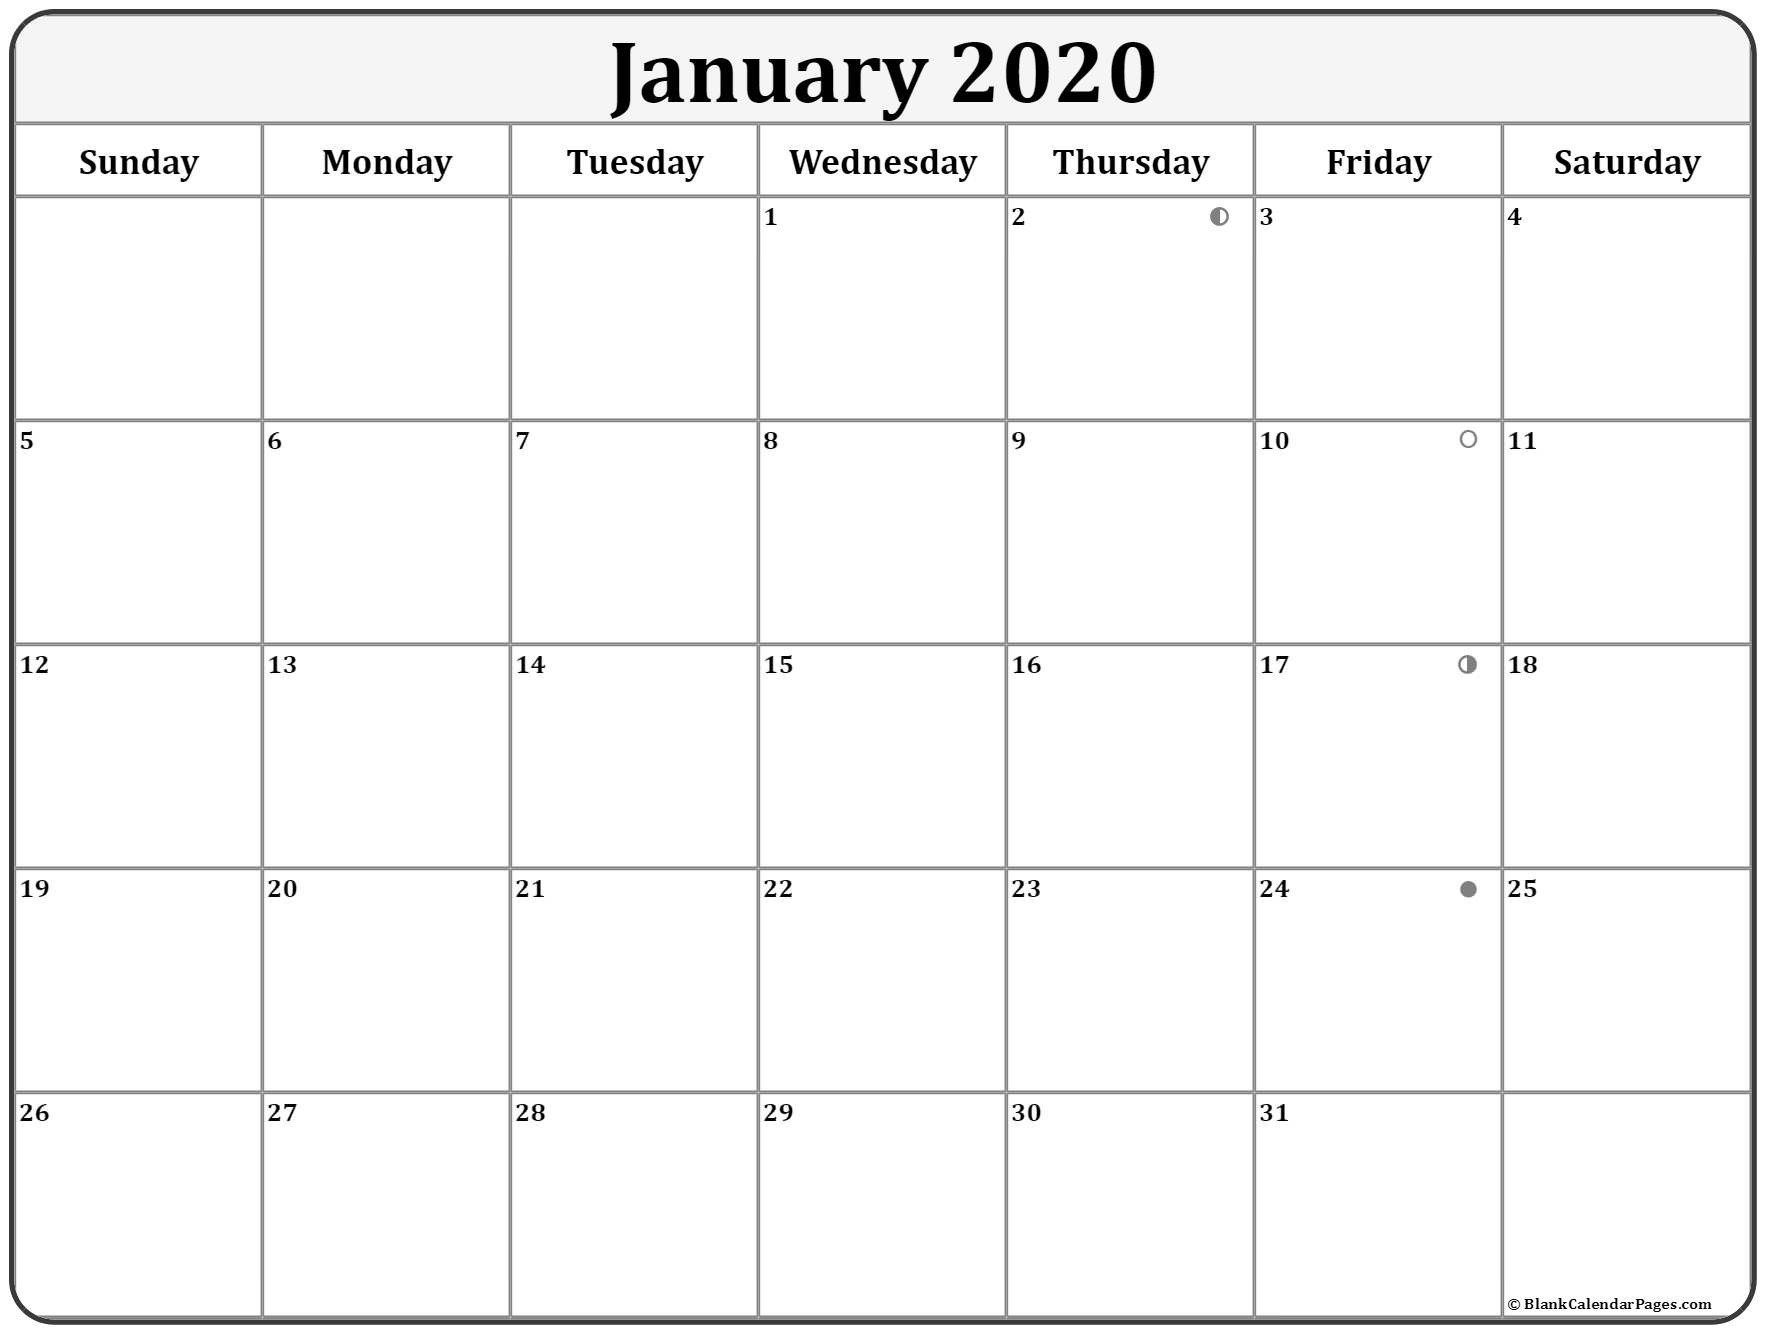 January 2020 Lunar Calendar | Moon Phase Calendar-Lunar Calendar January 2020